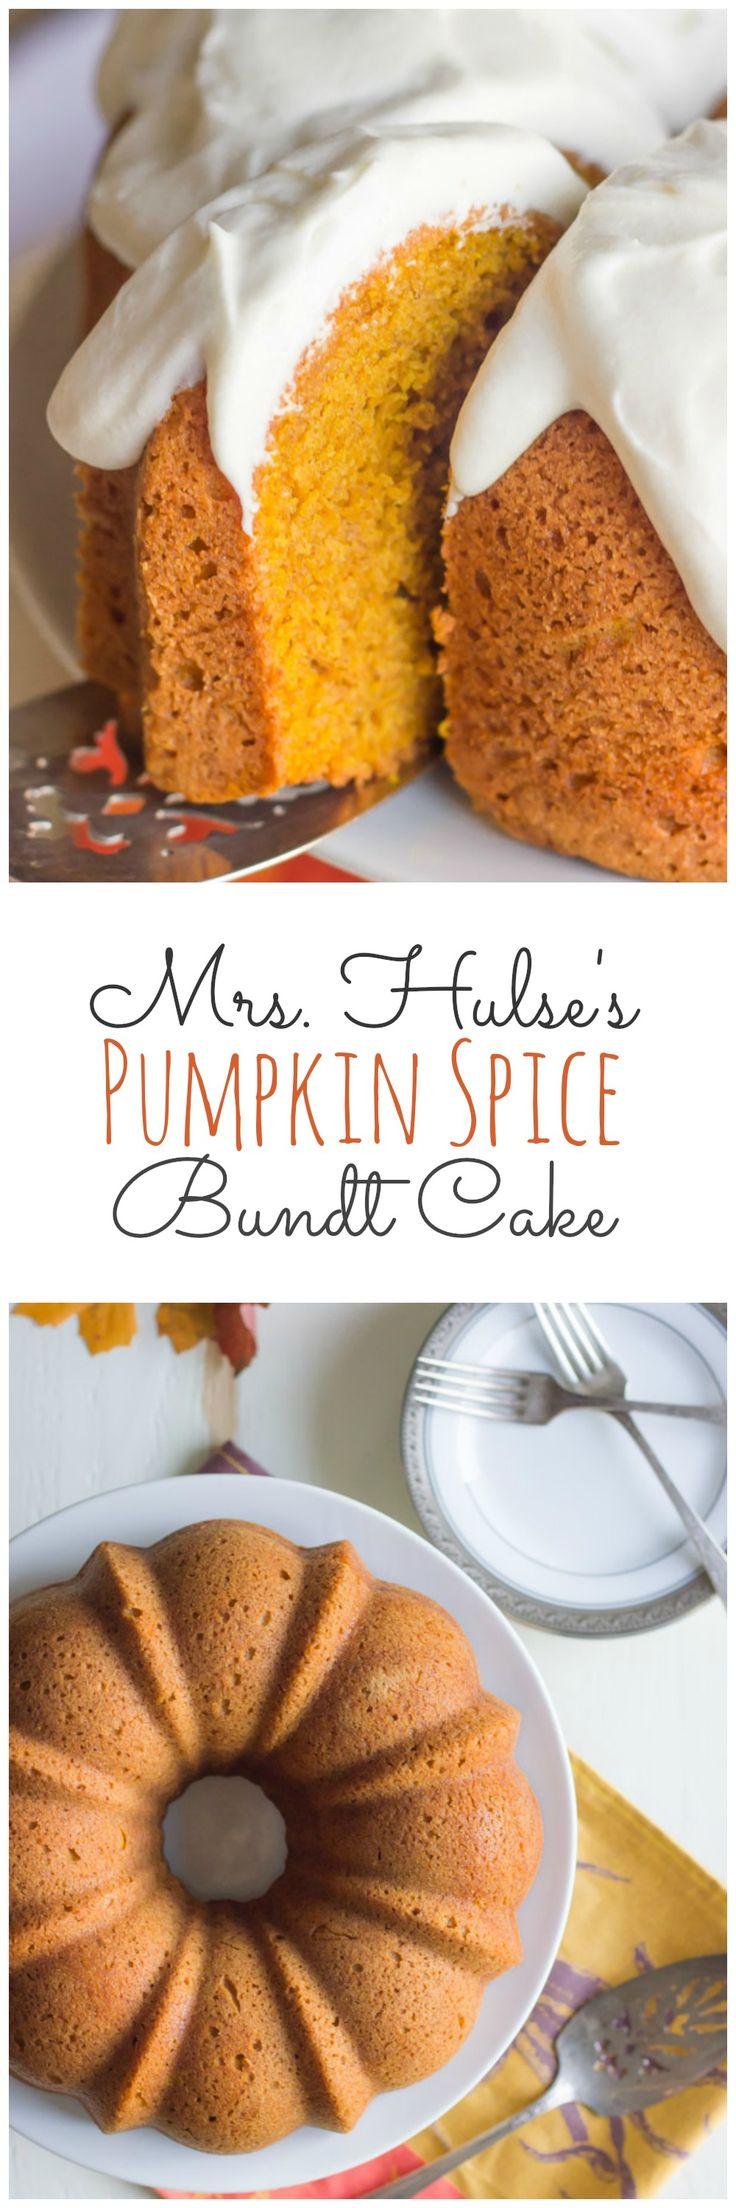 Mrs. Hulse's Pumpkin Spice Bundt Cake